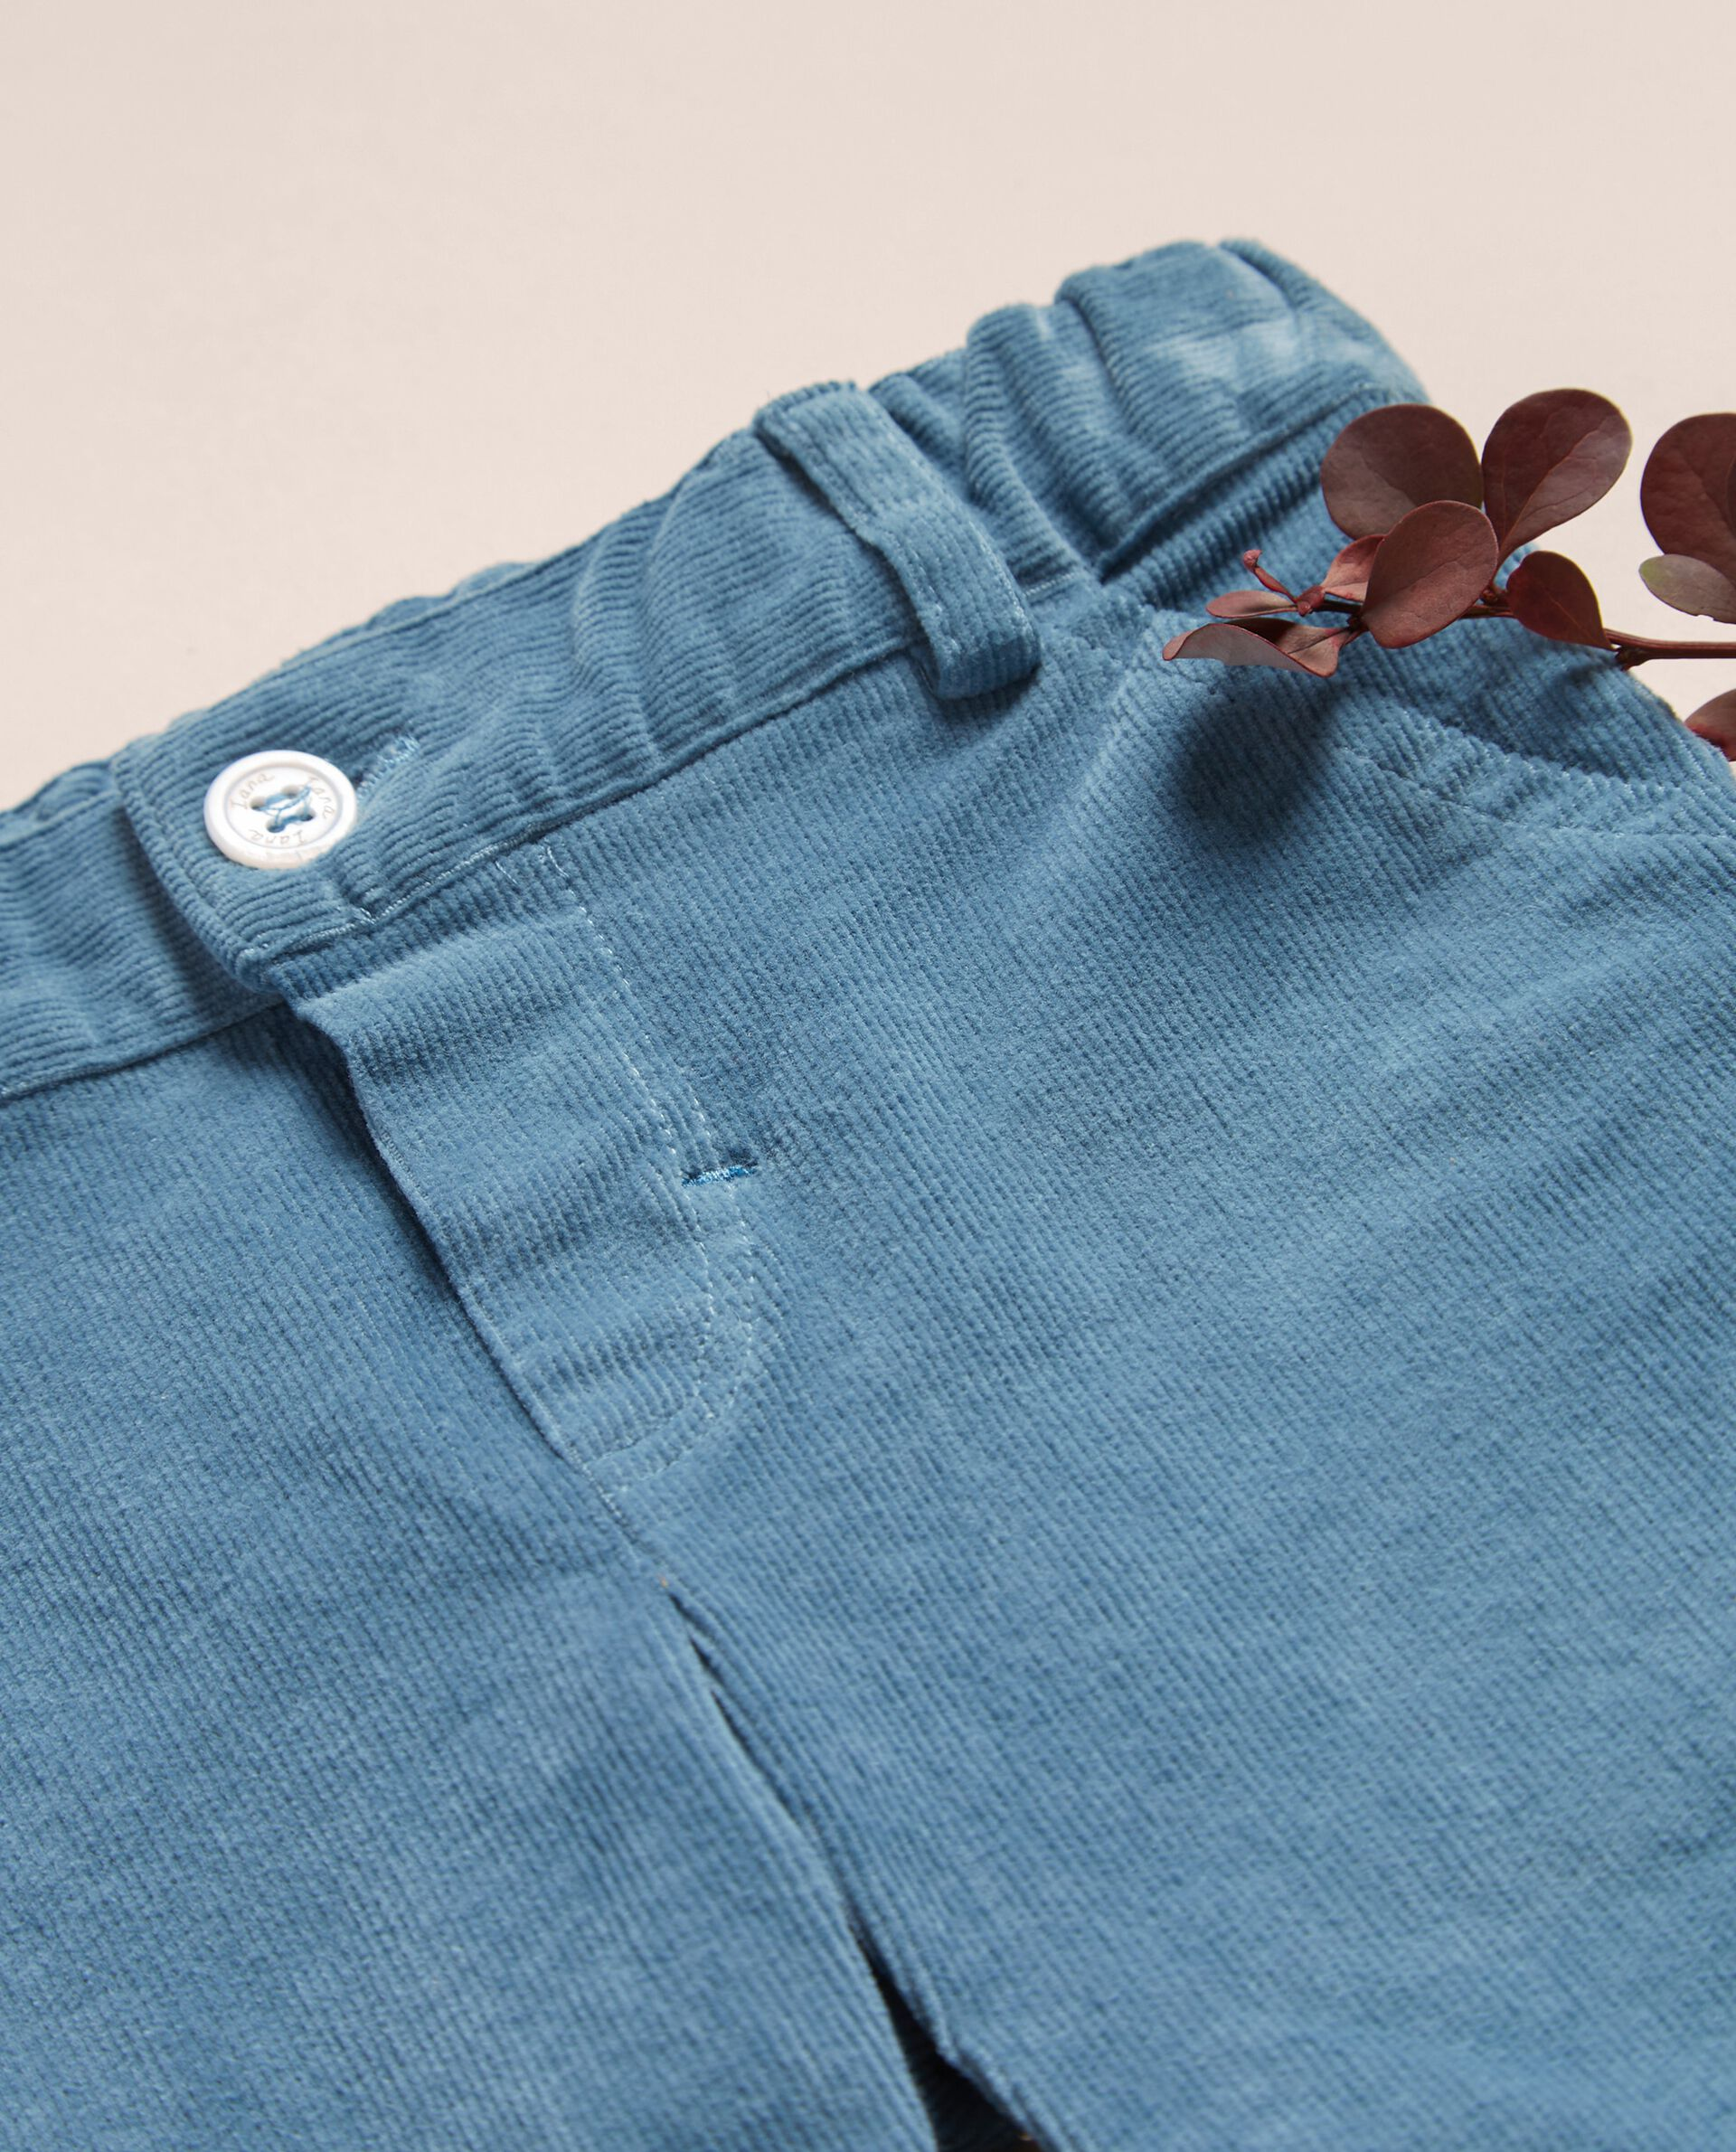 Pantaloni in velluto a coste neonato IANA Made in Italy